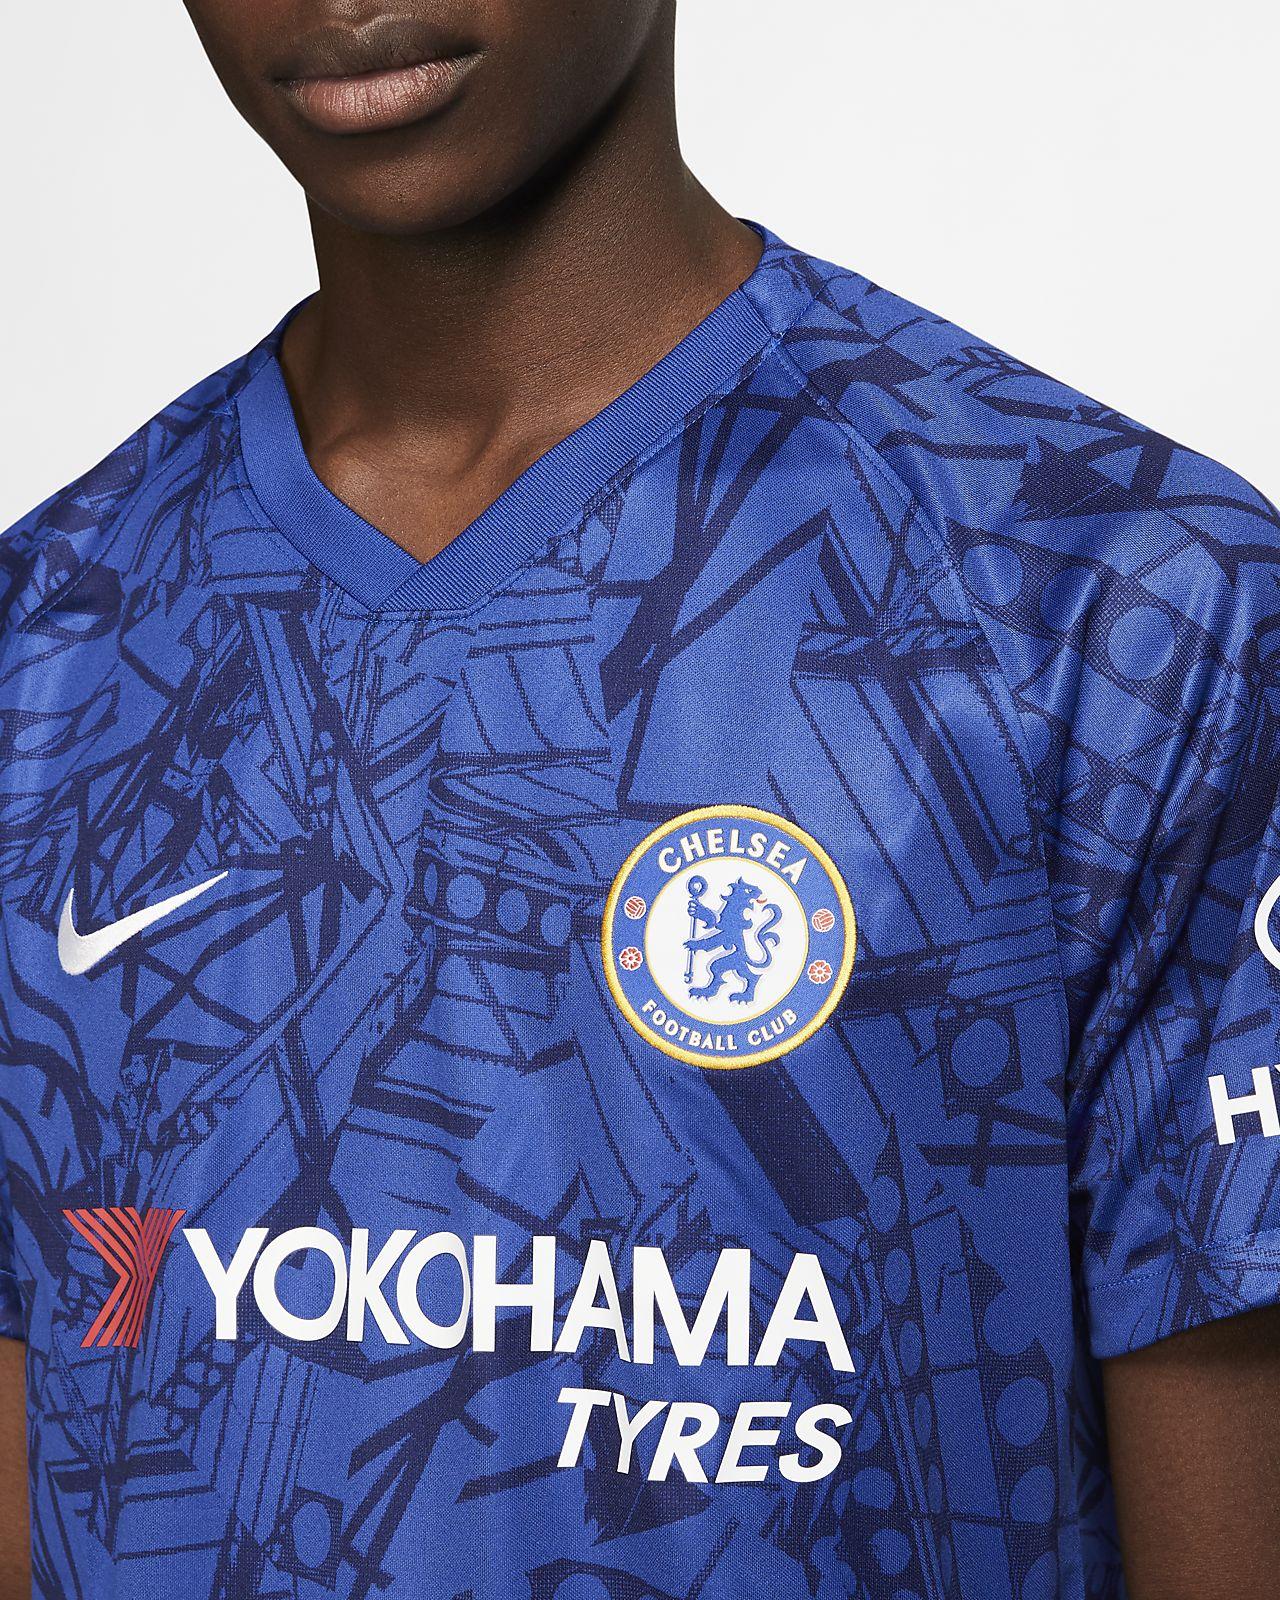 reputable site 9c0a8 0c9a4 ... Chelsea FC 2019 20 Stadium Home Men s Football Shirt